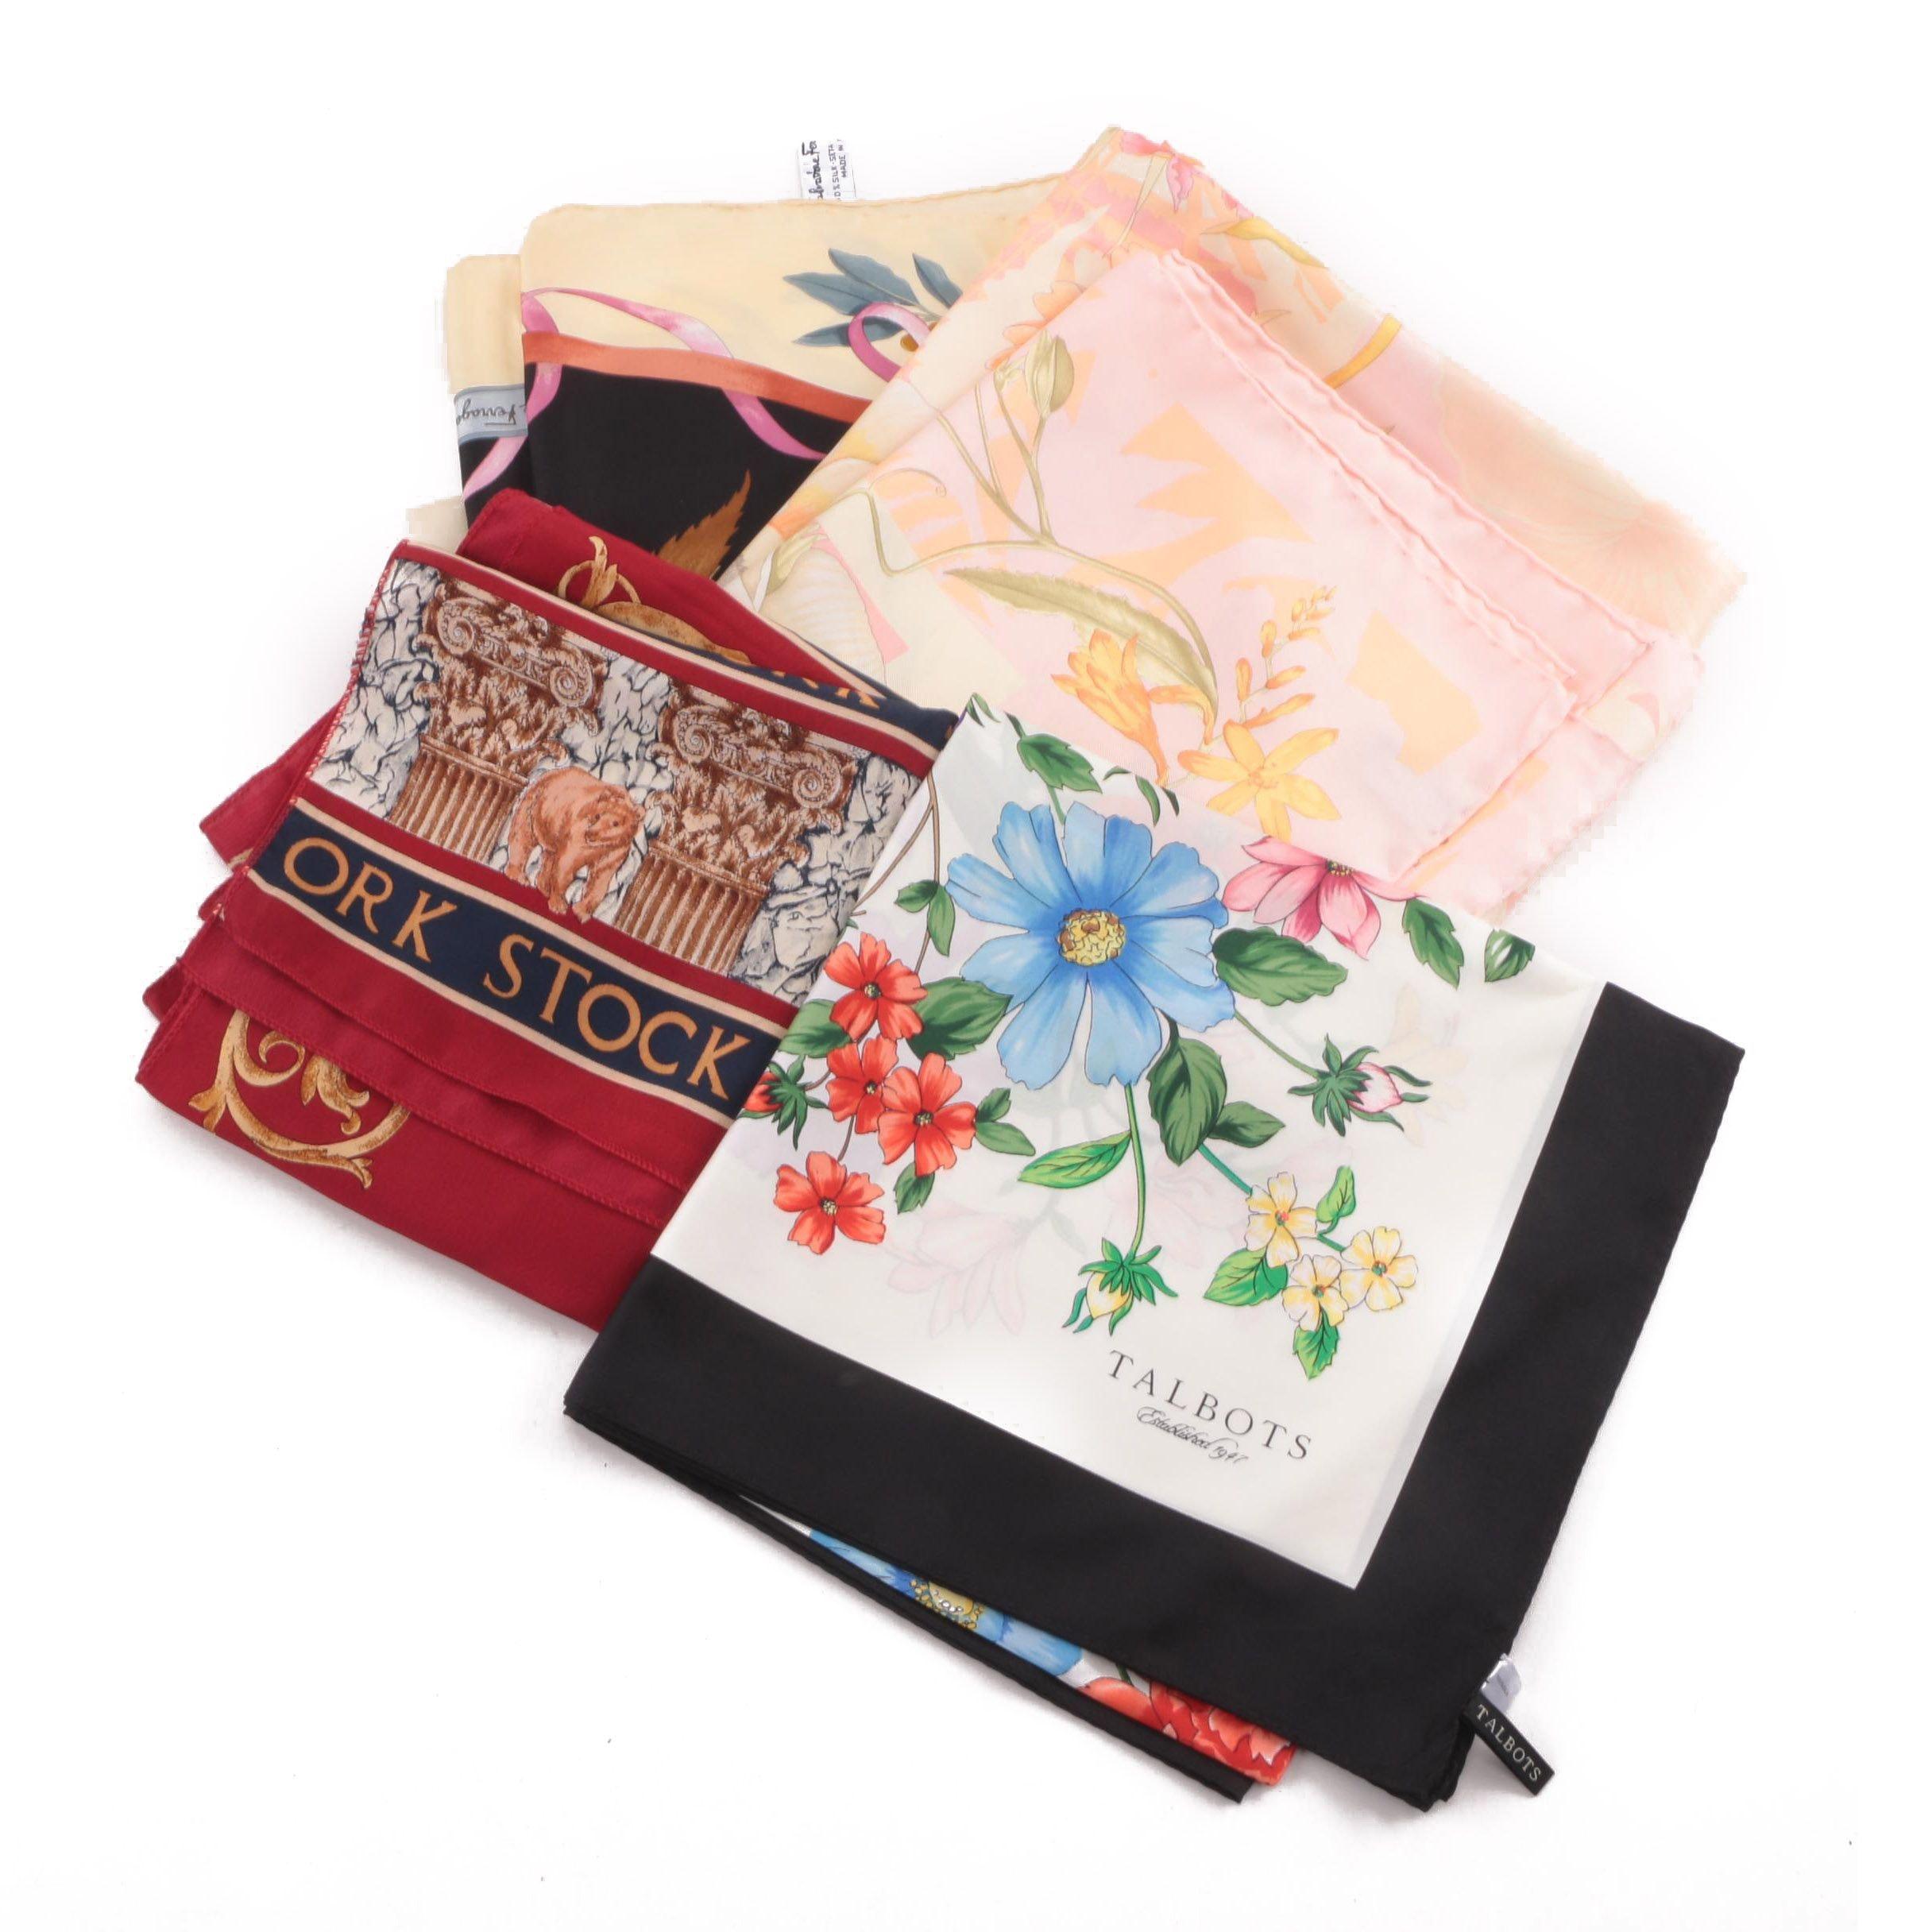 Salvatore Ferragamo, Talbots and Voslo Designs Silk Scarves